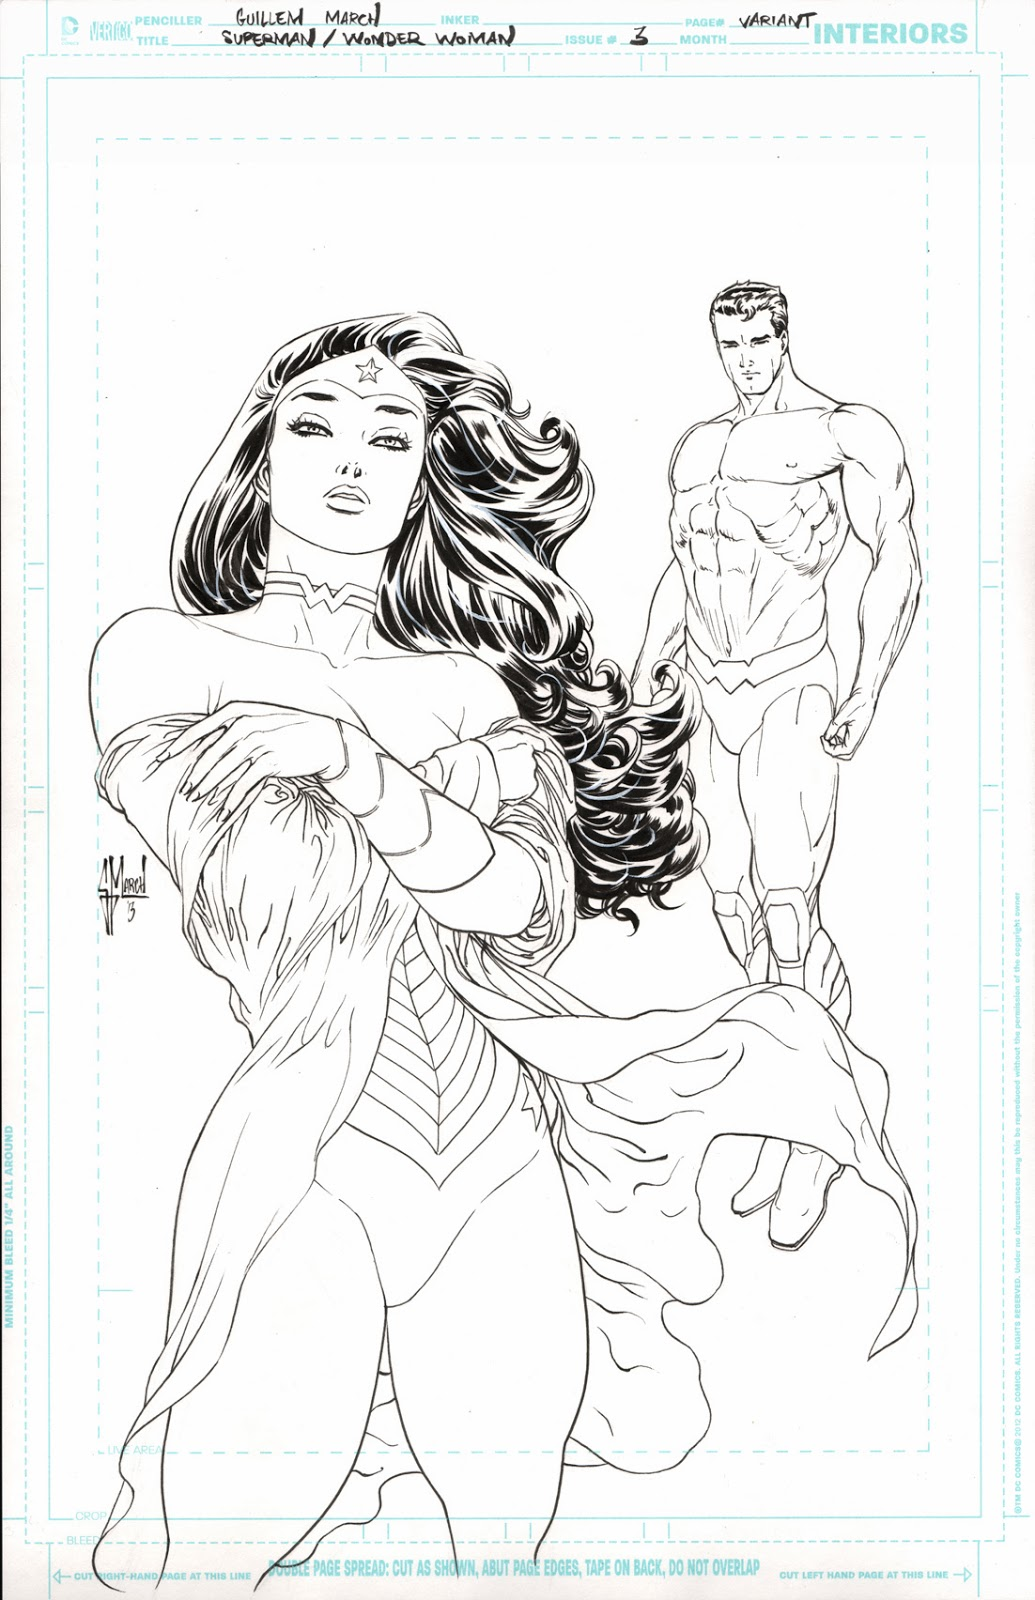 Drawn women muscular Superman Muscles To scan Guillem